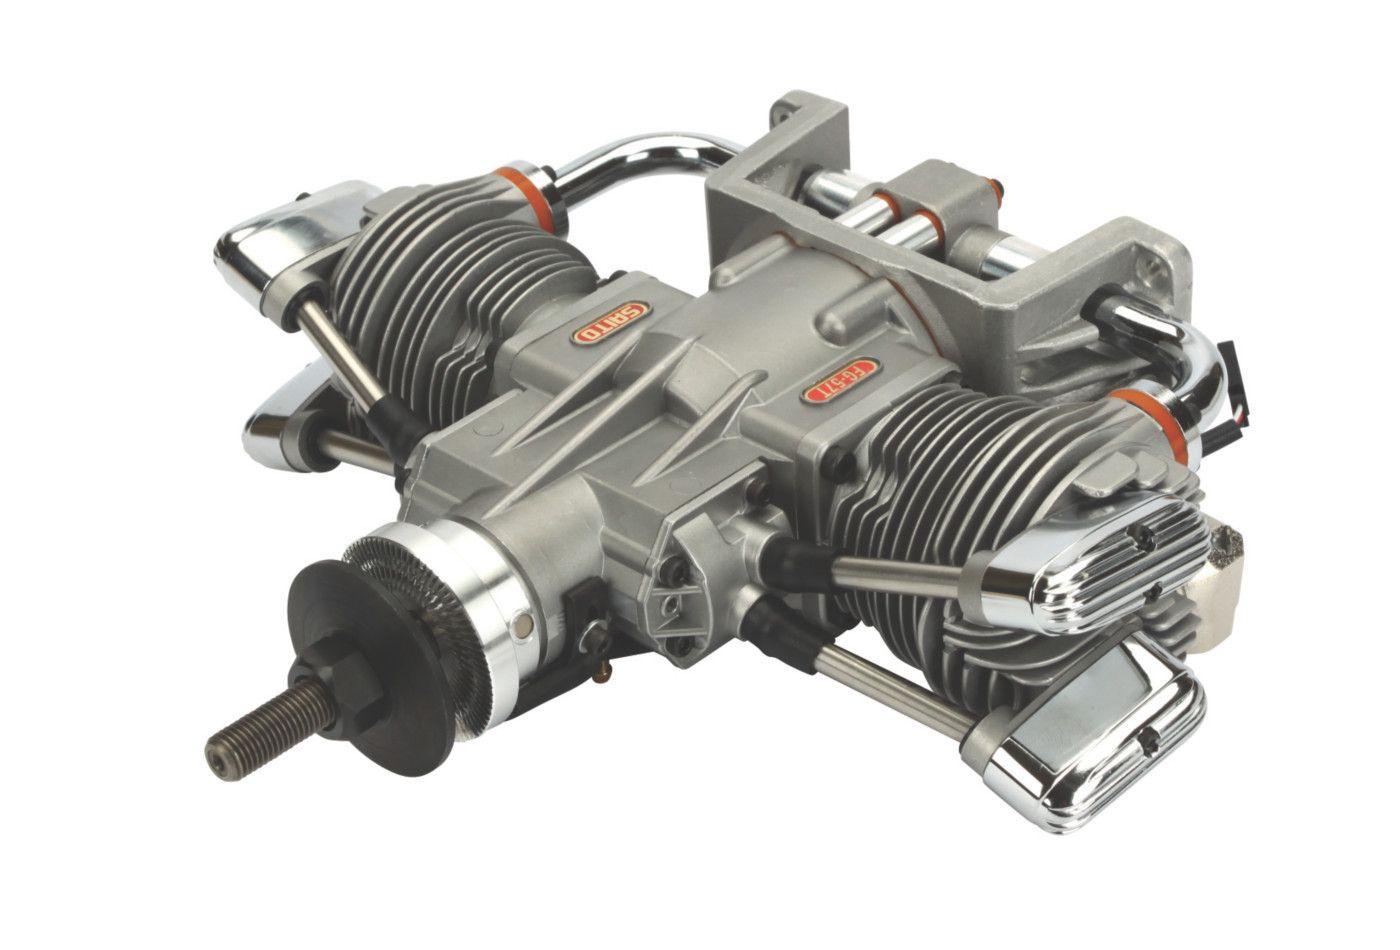 medium resolution of image for 57cc gas twin engine 4 stroke bg from horizonhobby